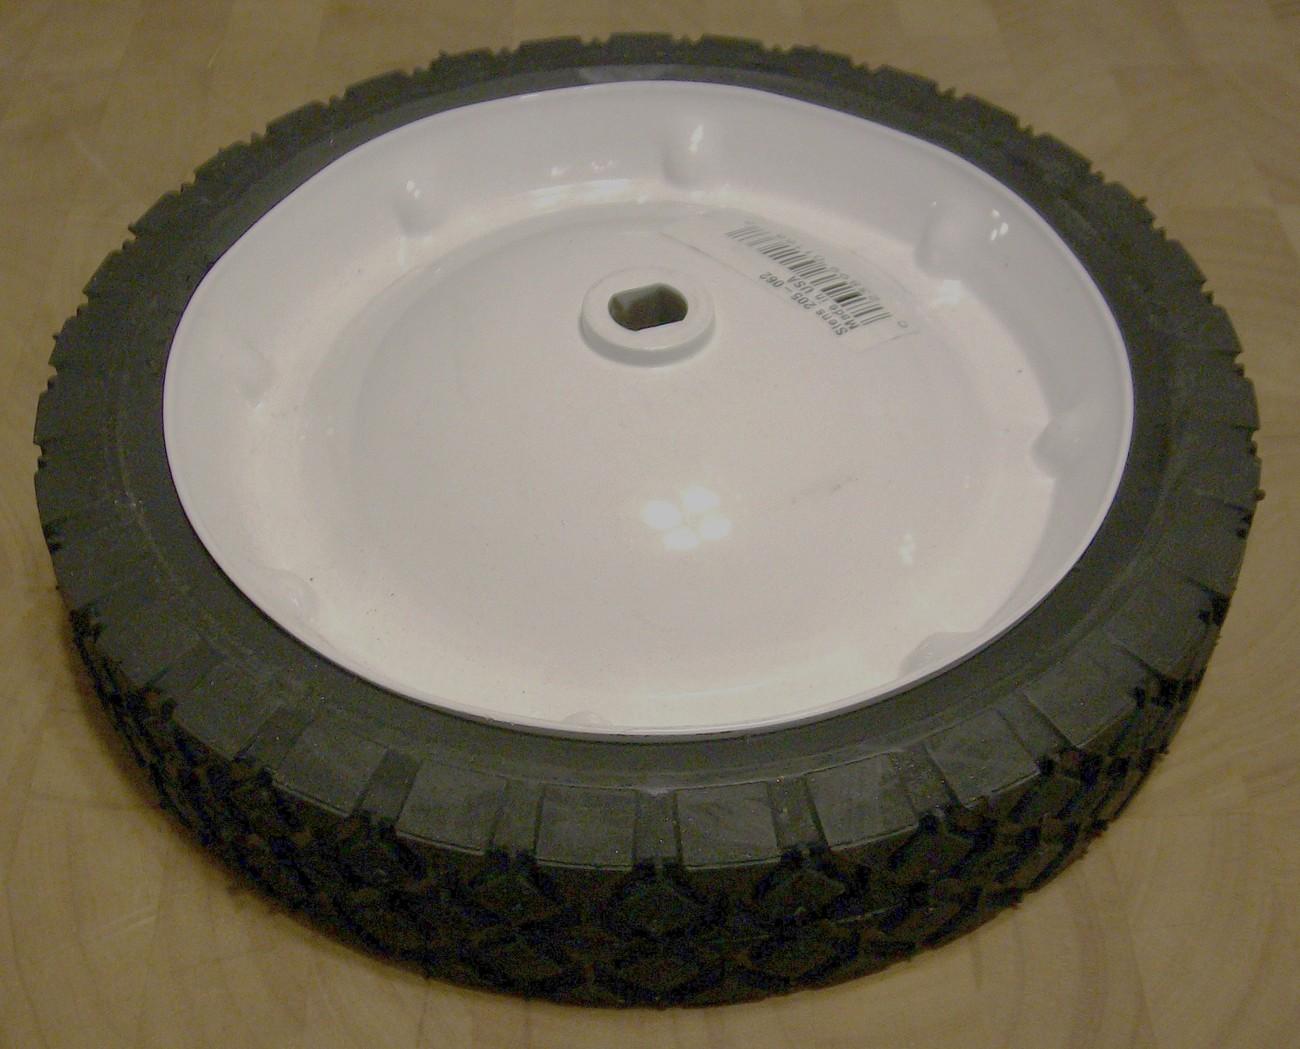 Snapper self propelled drive wheel tire 1-4604, 14604, 22801, 7012345, 7014604